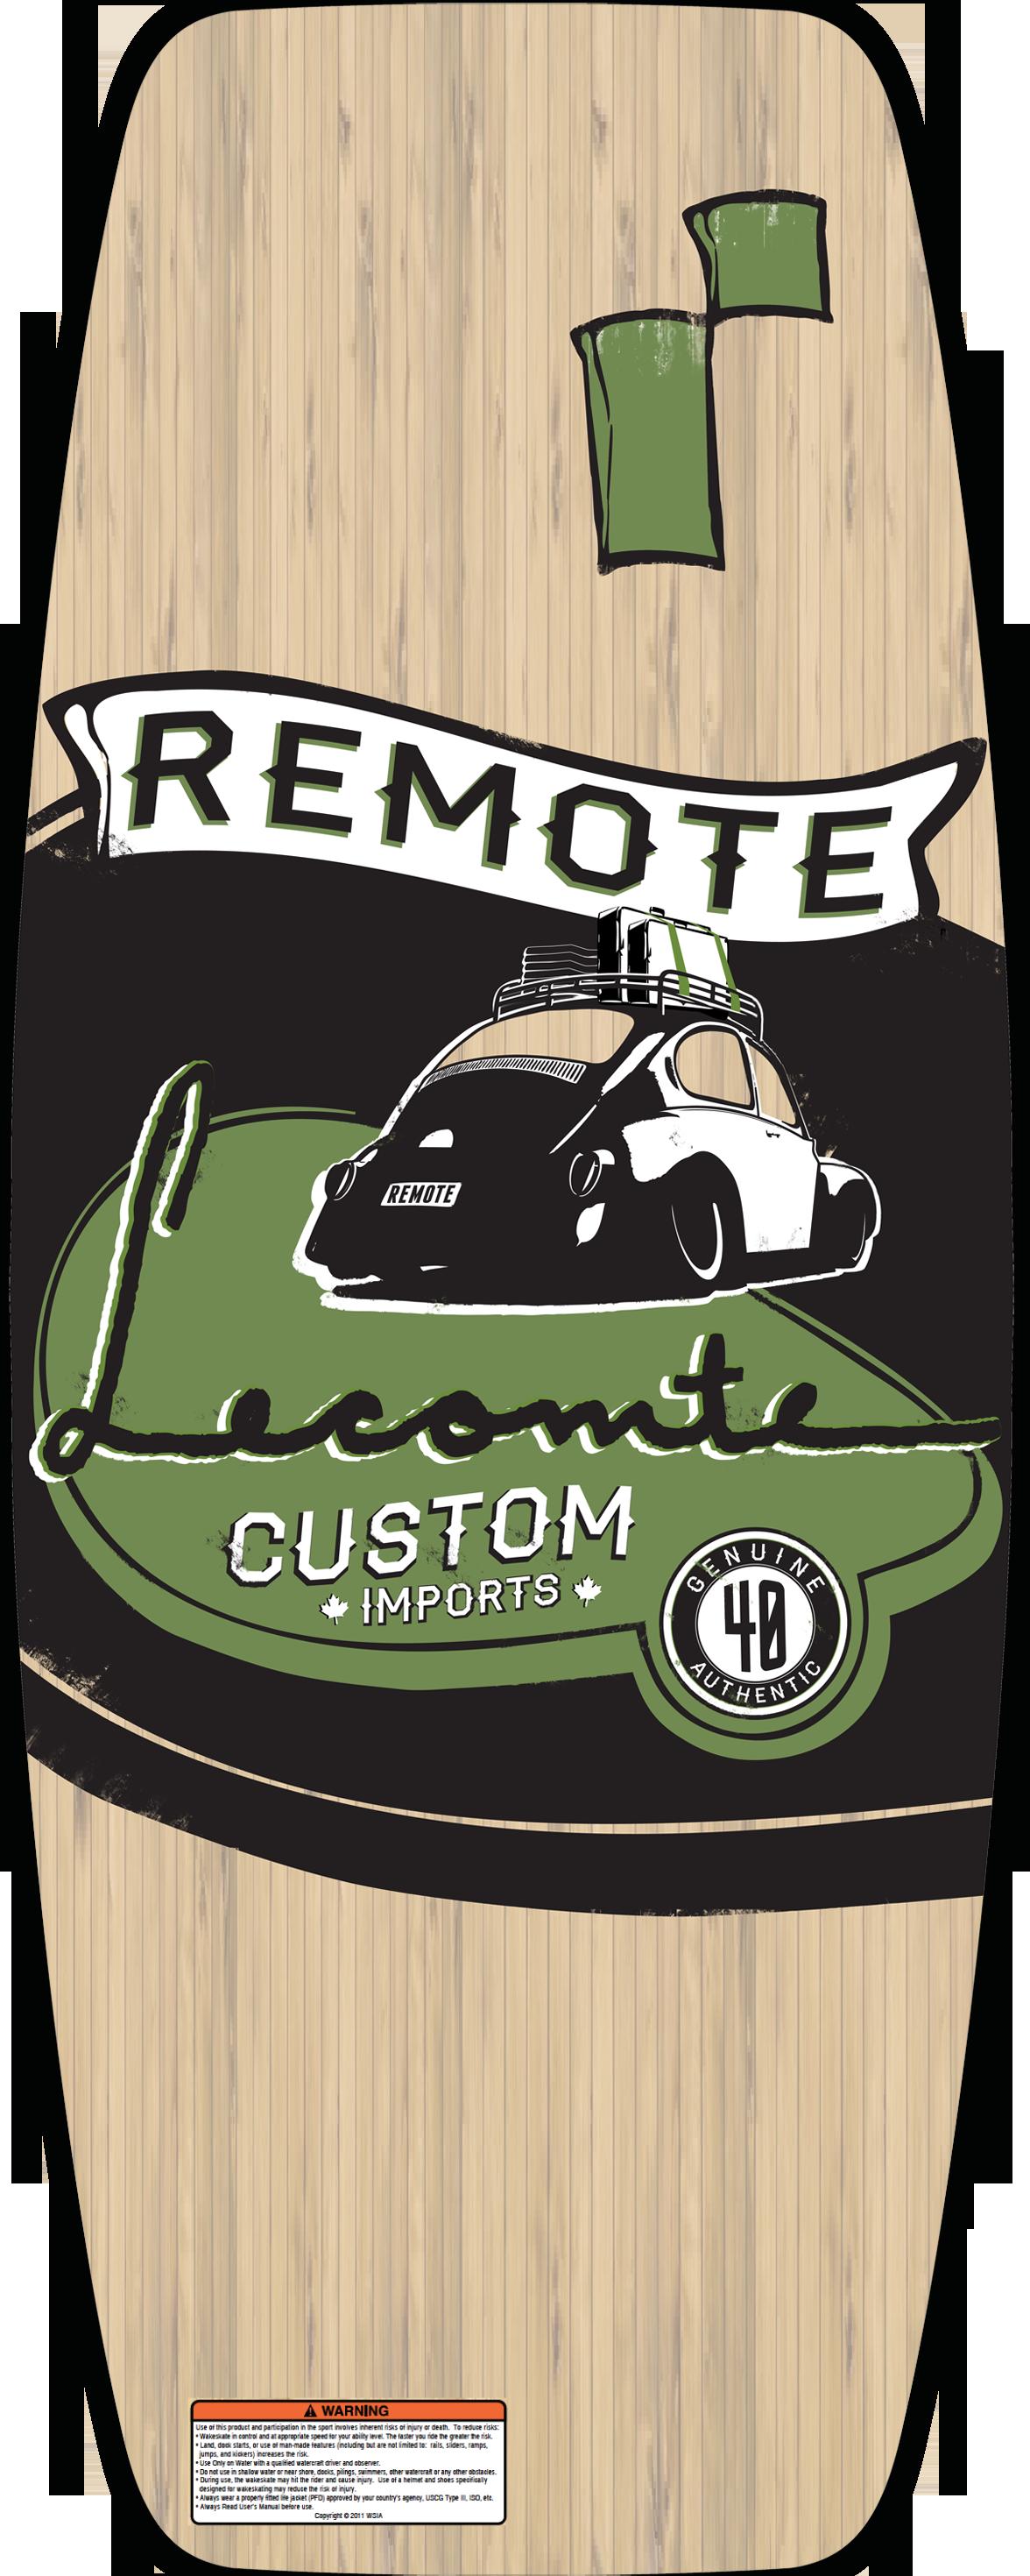 View Lecomte's Customs